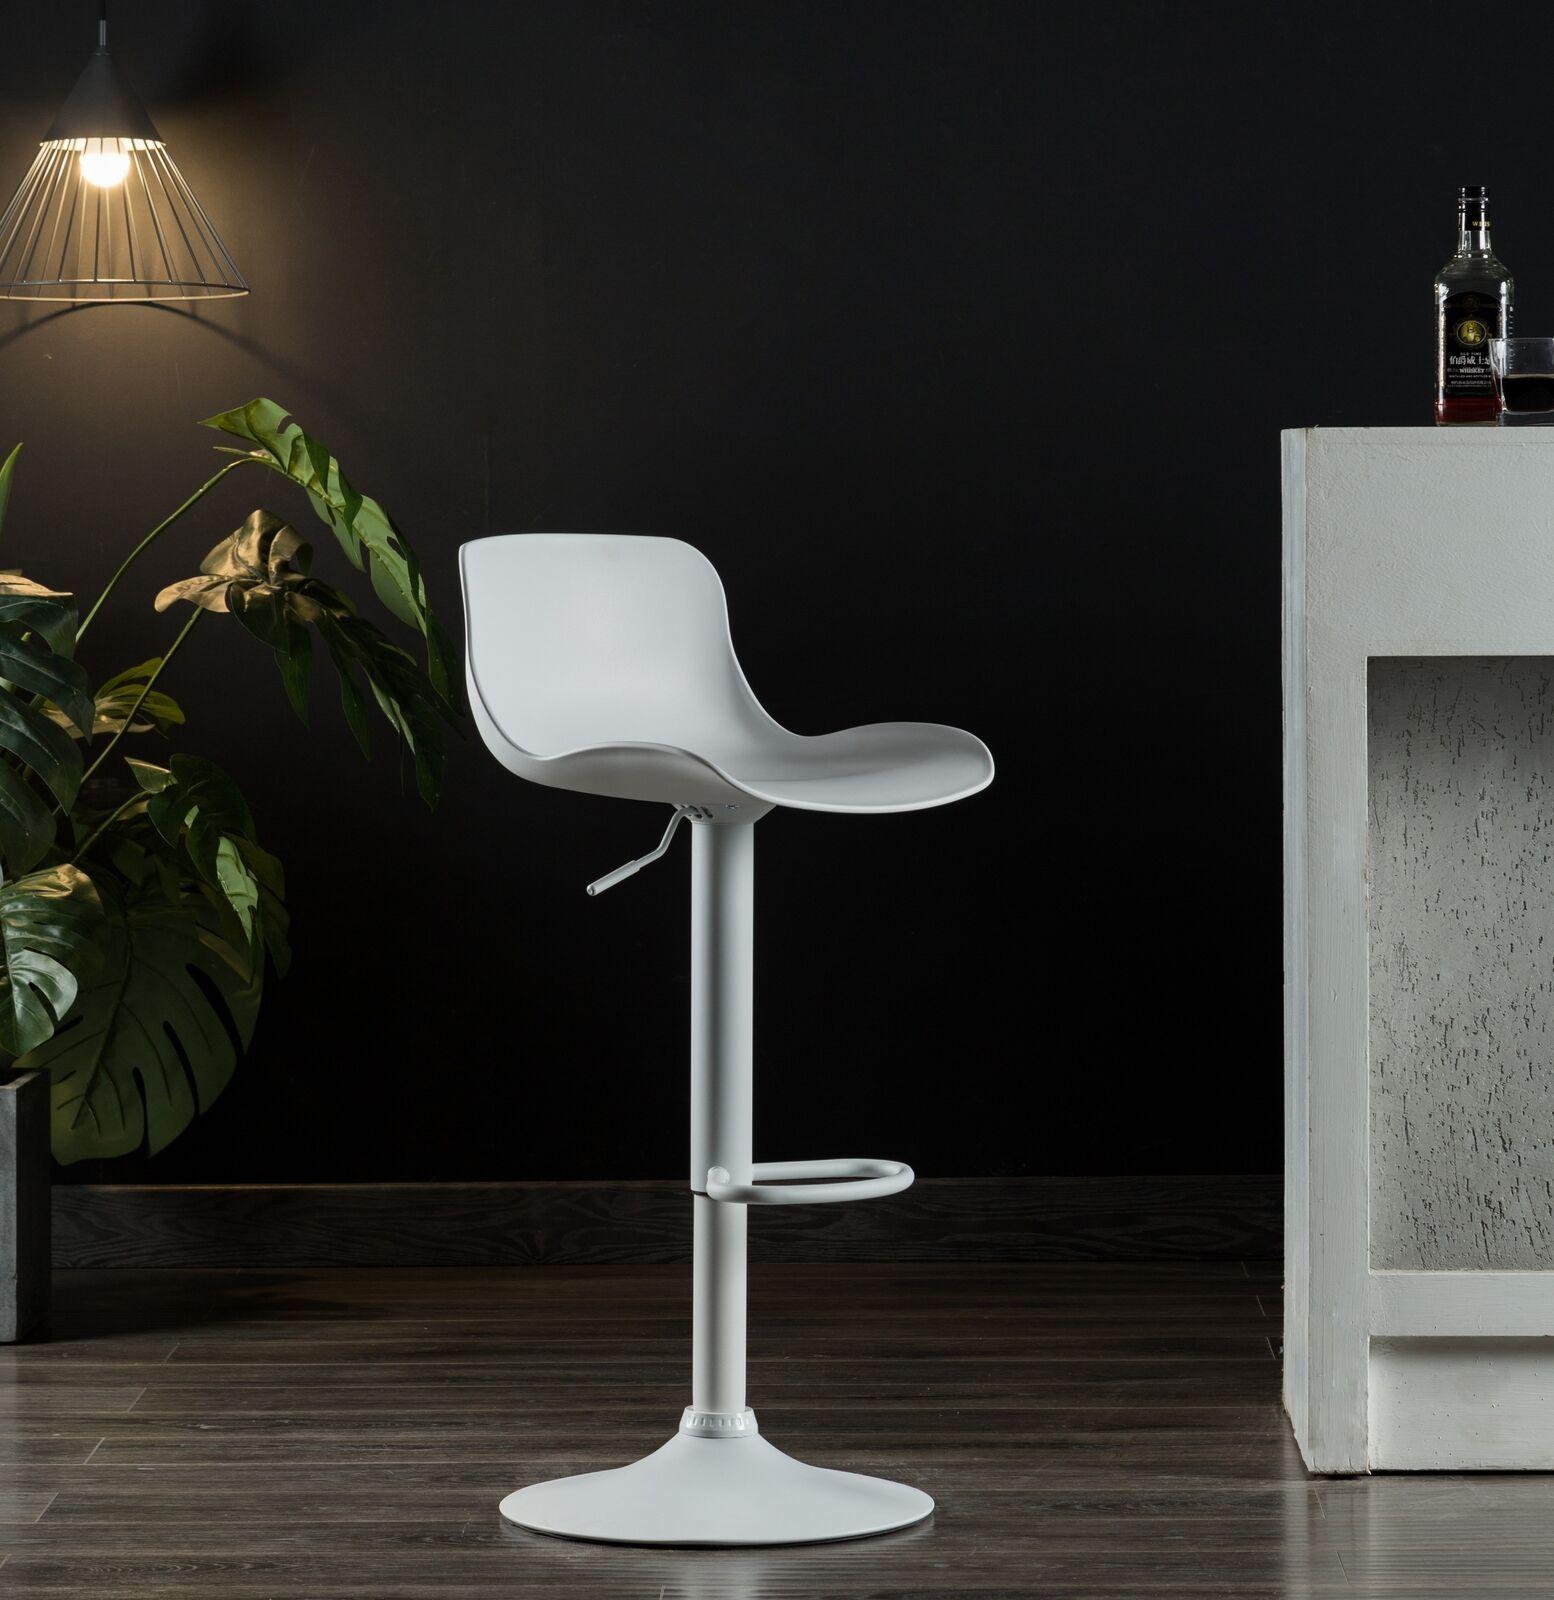 Set Of 2 Modern Bar Stools Adjustable Swivel Counter Height Bar Chairs Black 89 99 Modern Chair Ideas Of Modern C Modern Bar Stools Modern Bar Bar Stools